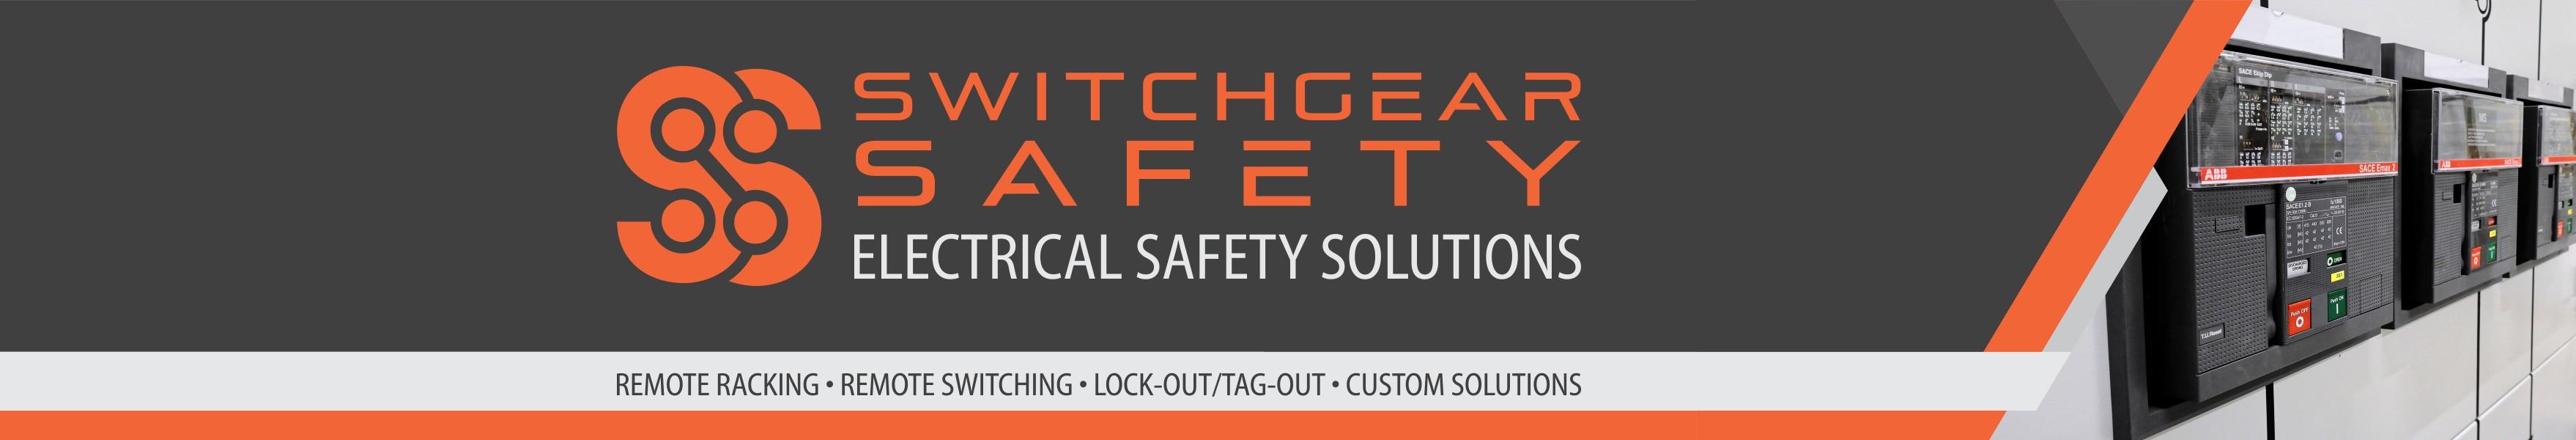 Switchgear Safety LLC   LinkedIn